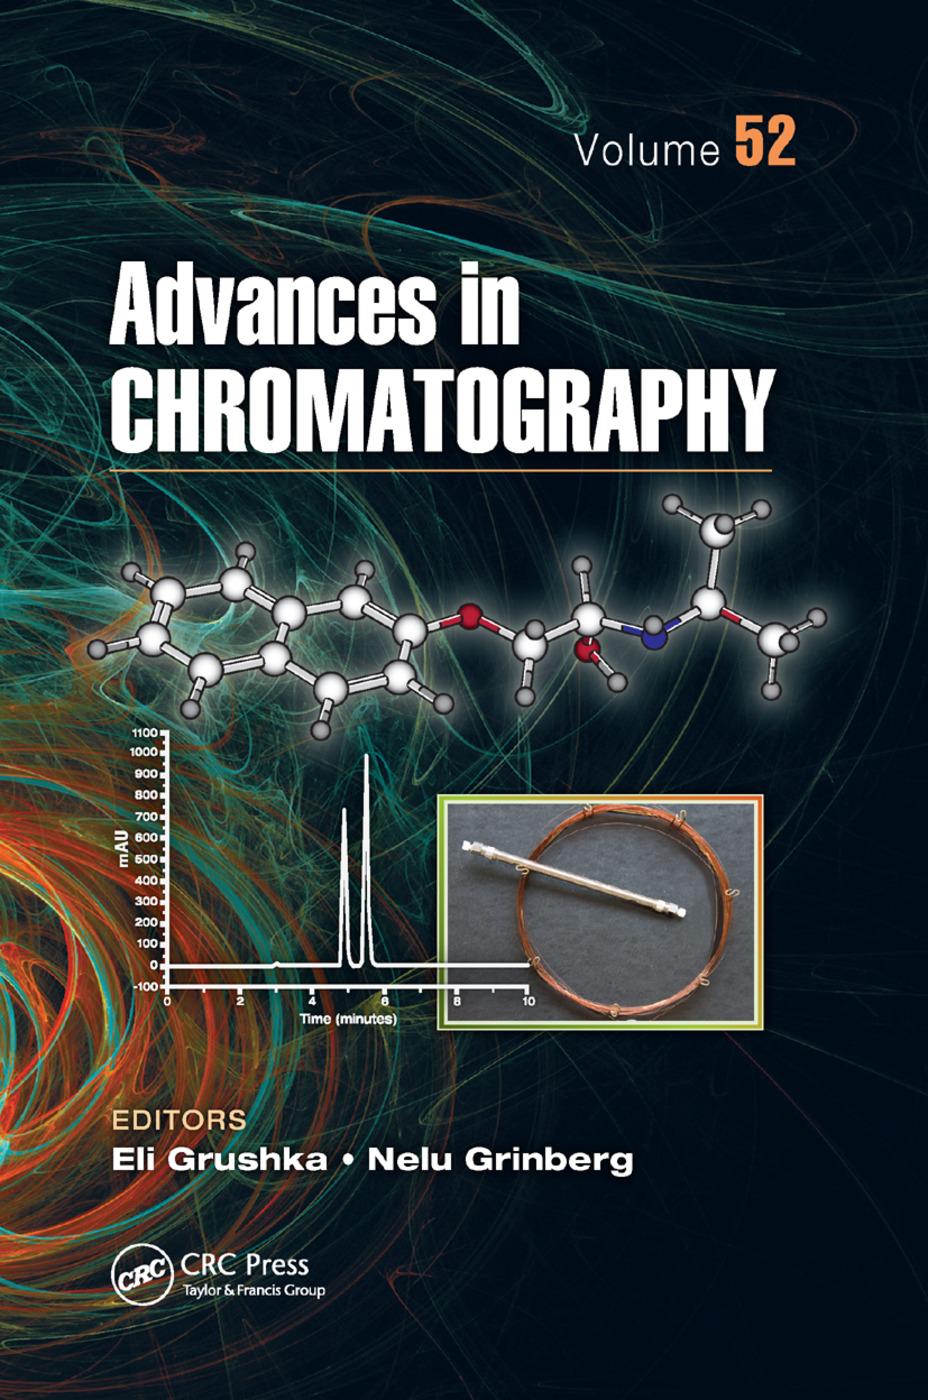 Advances in Chromatography, Volume 52 book cover